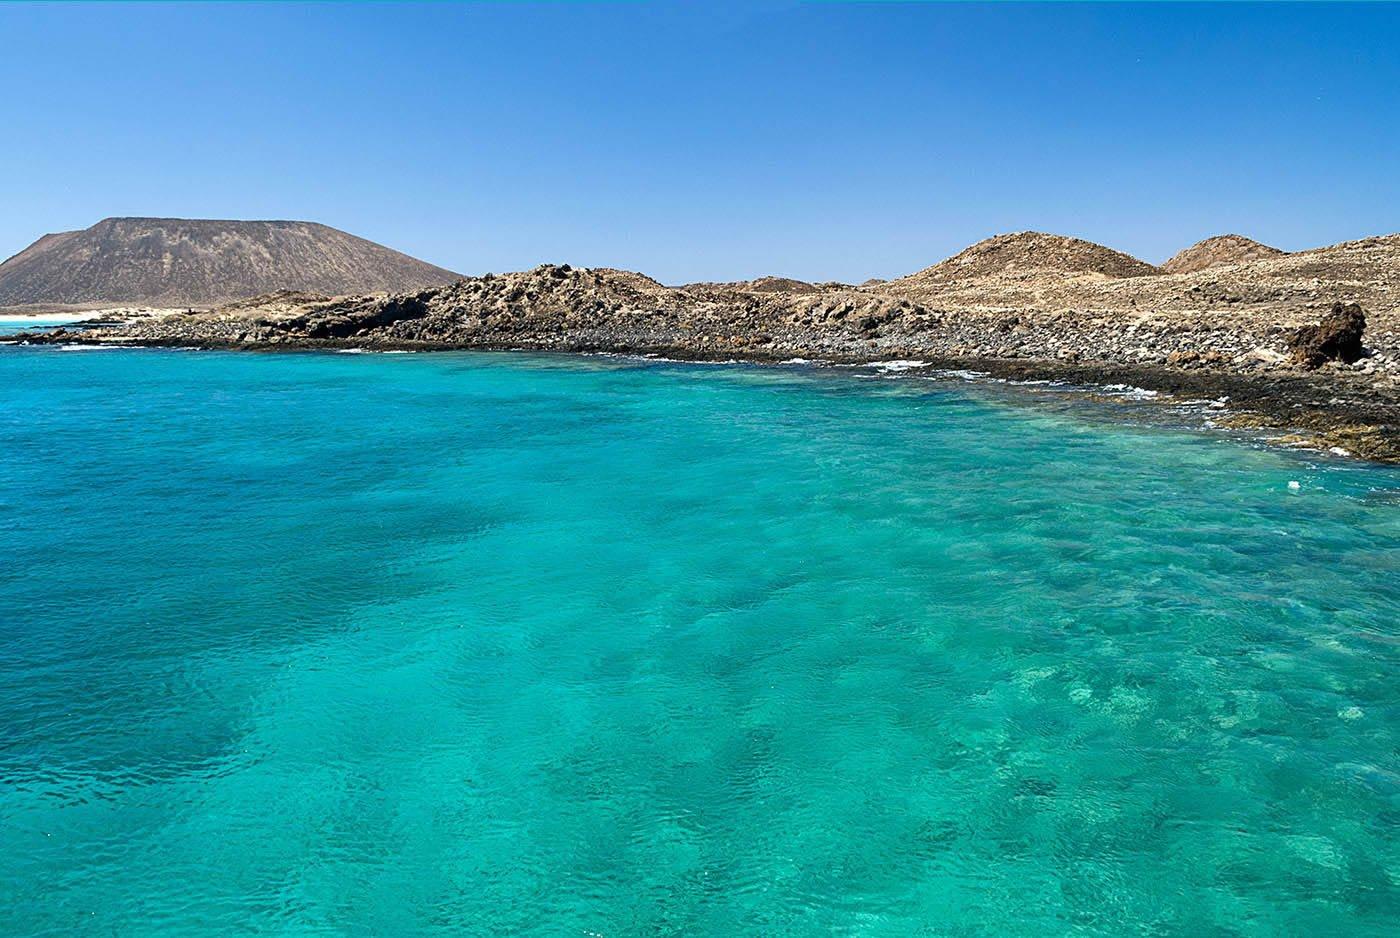 Vuelo Madrid - Fuerteventura Ida y Vuelta 19,98€